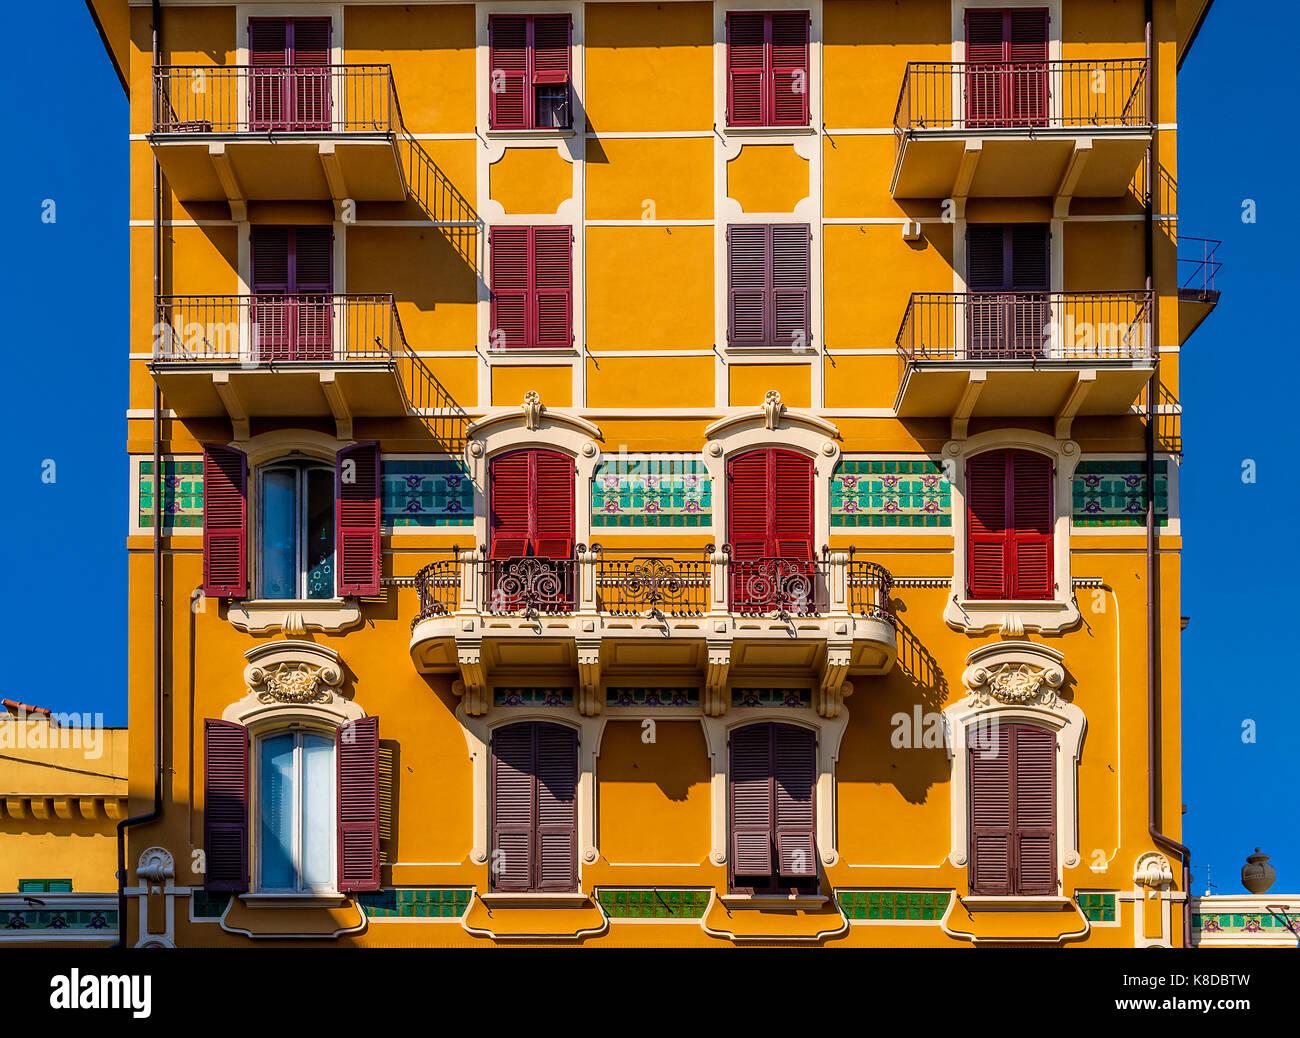 Italia liguria chiavari - piazza Roma - casa stile liberty Immagini Stock